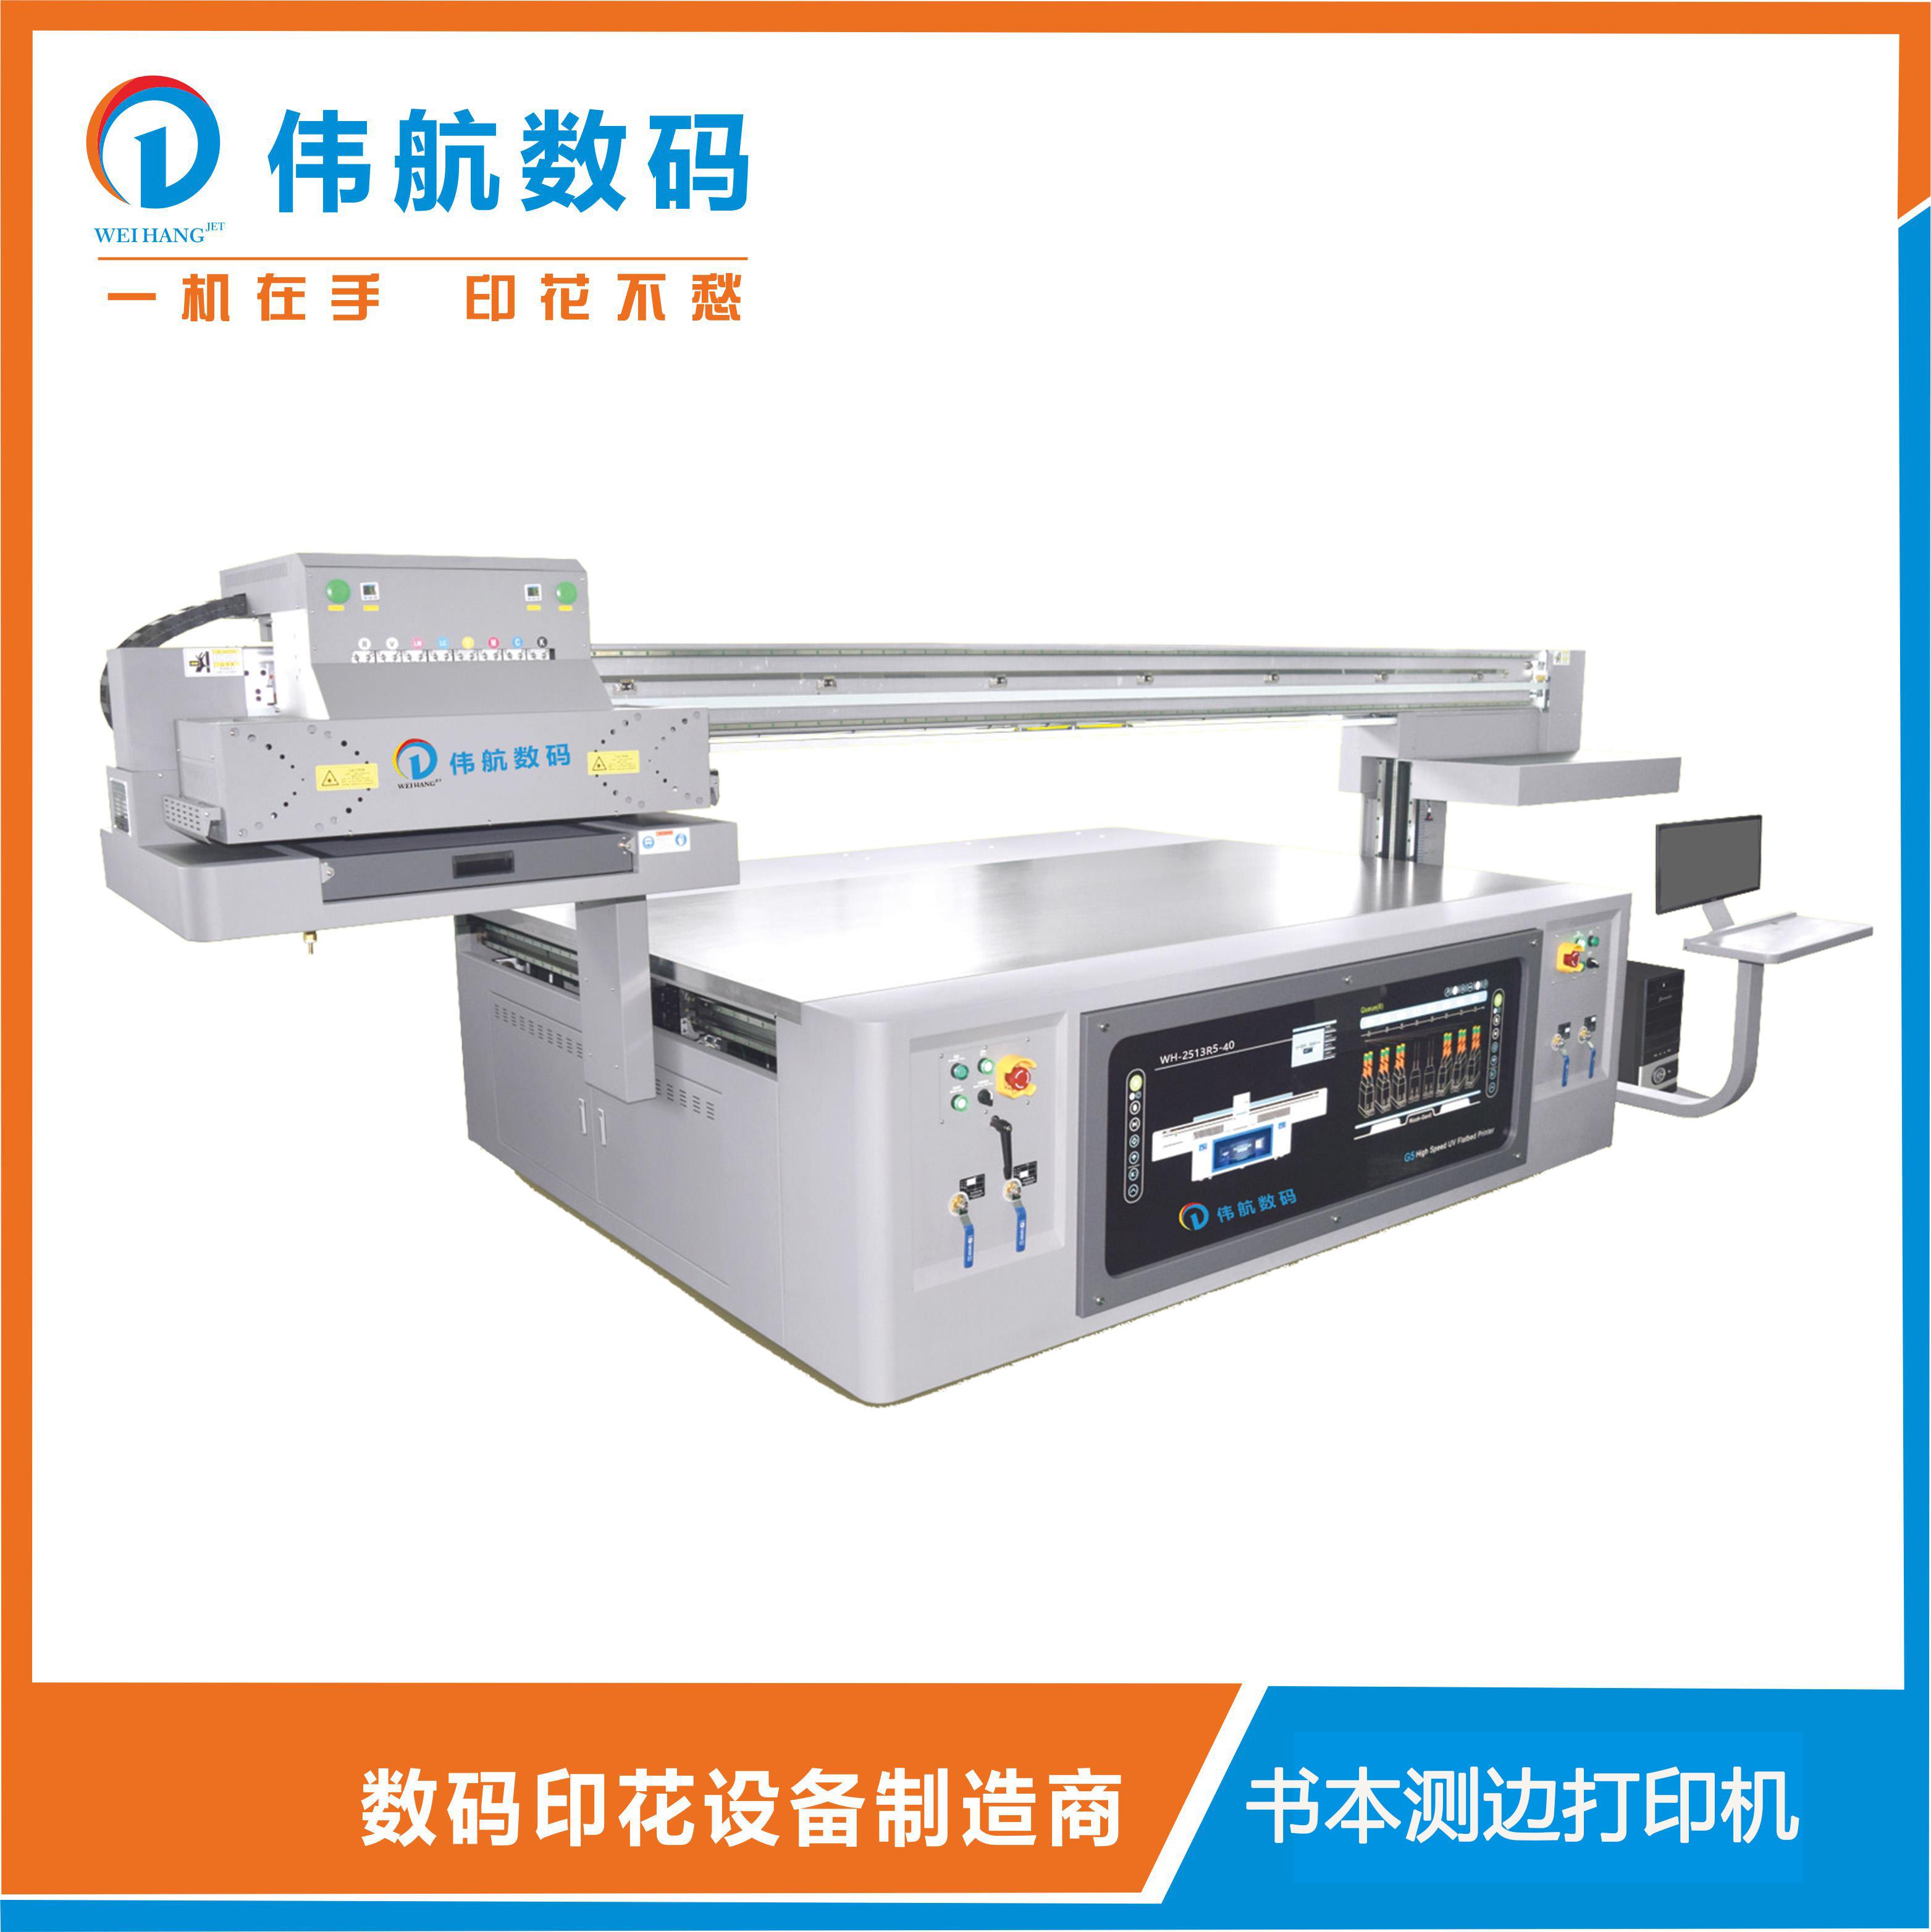 书本测边打印机WH-2513R5-40